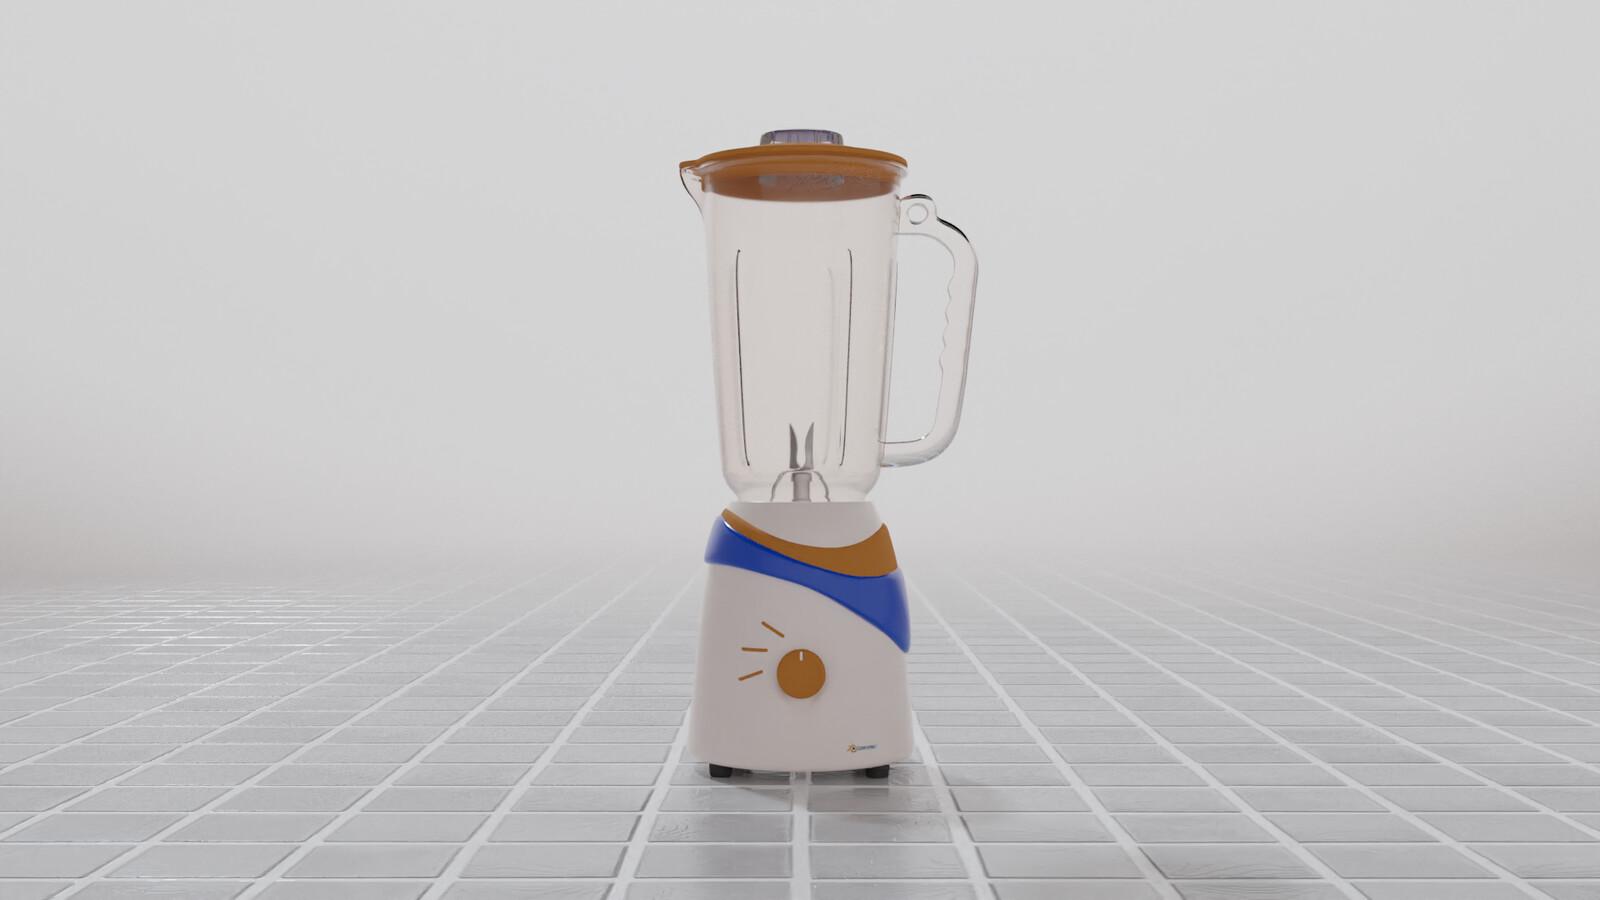 Final blender